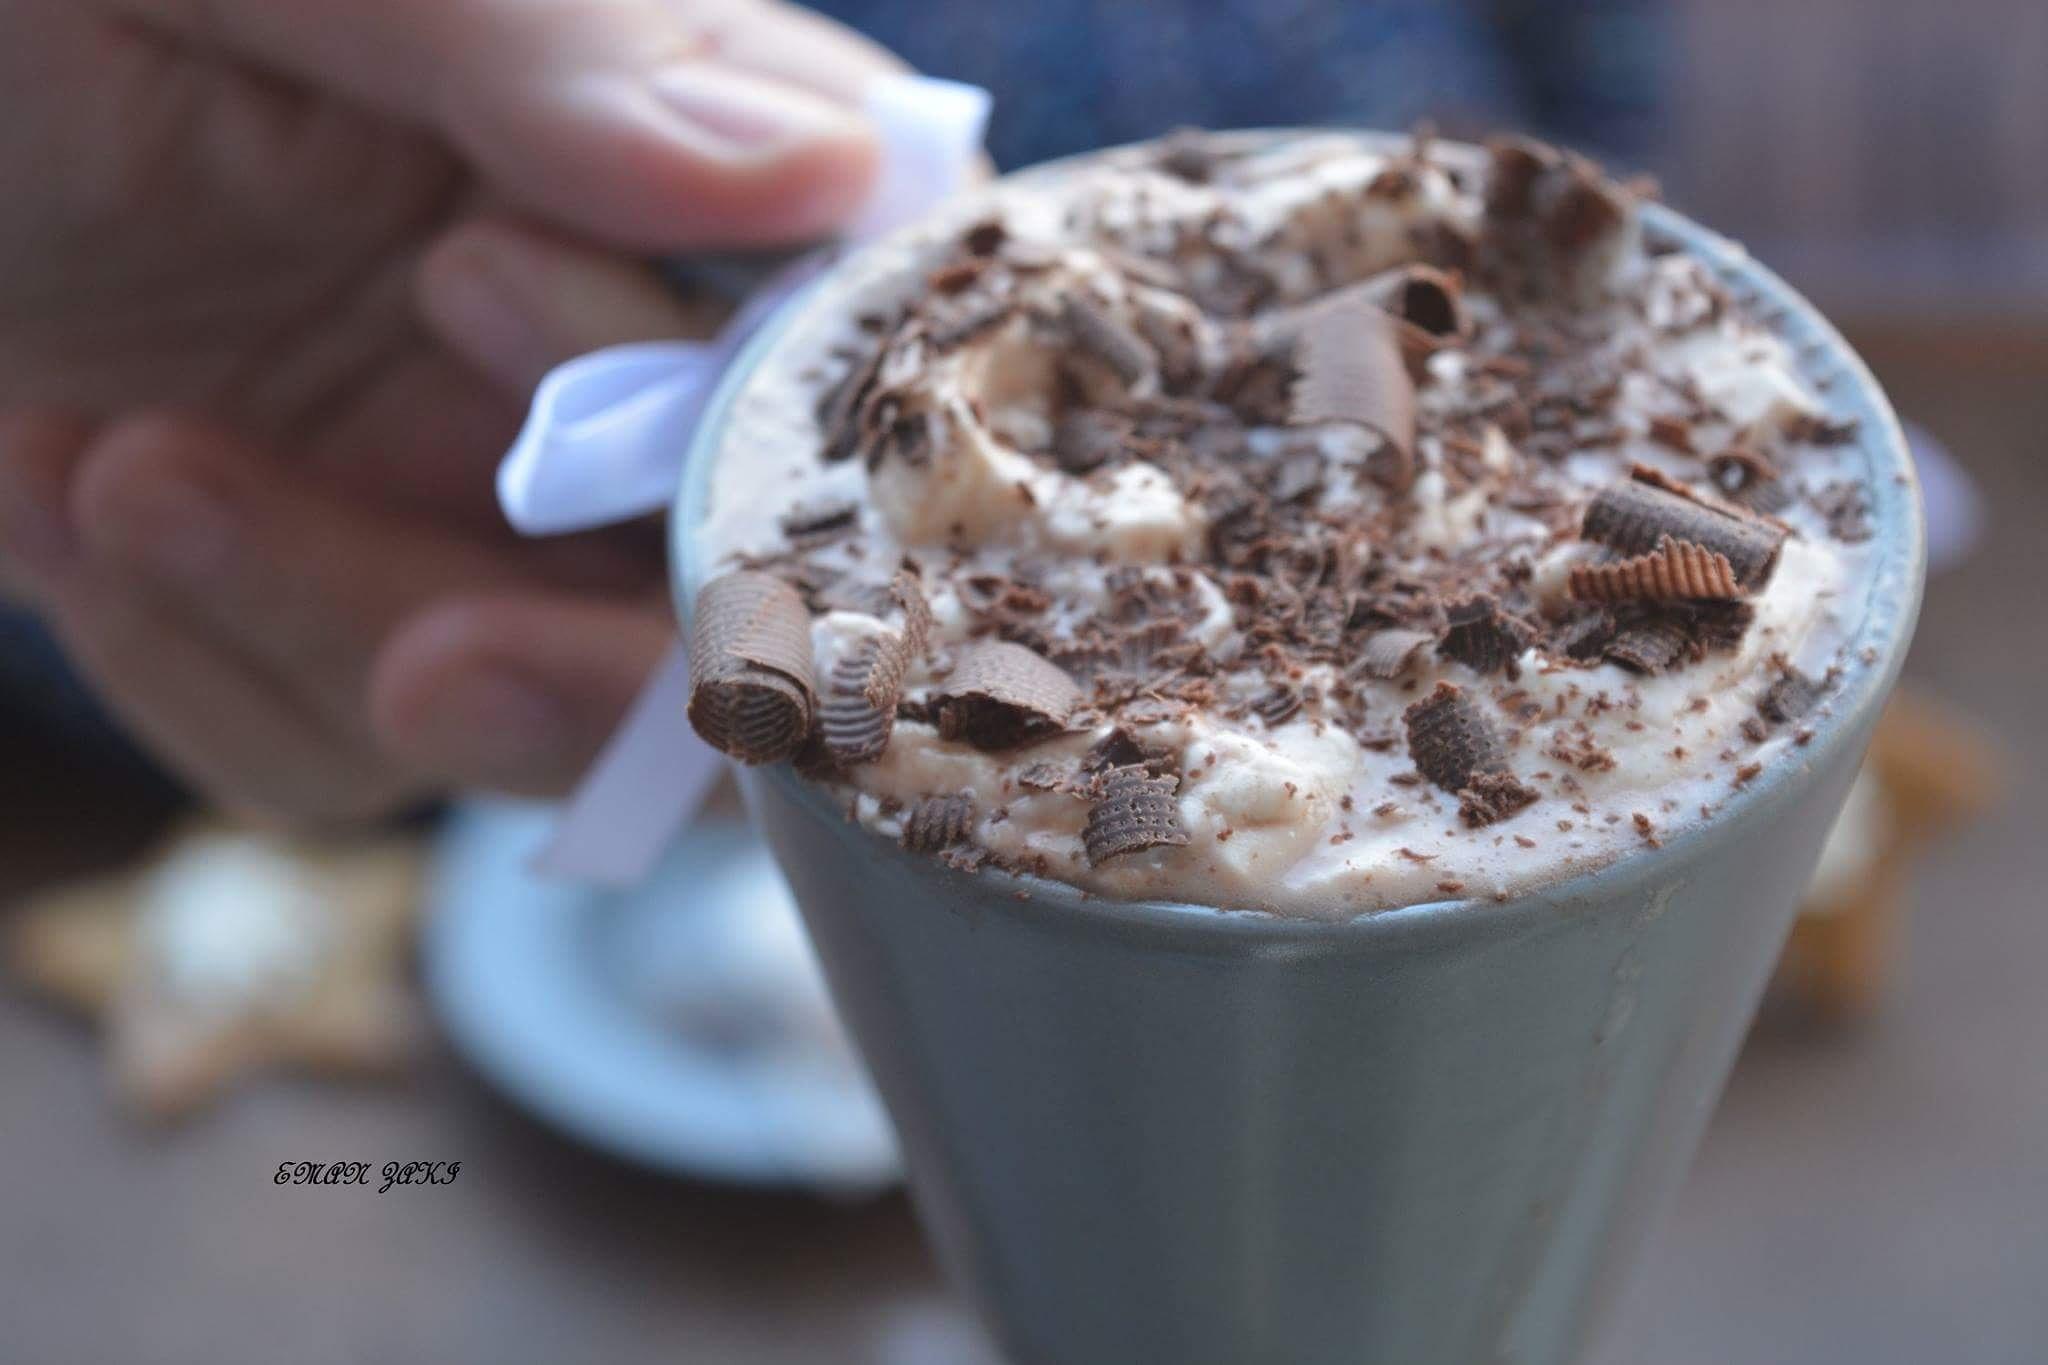 hot chocolate by Meme Zaki